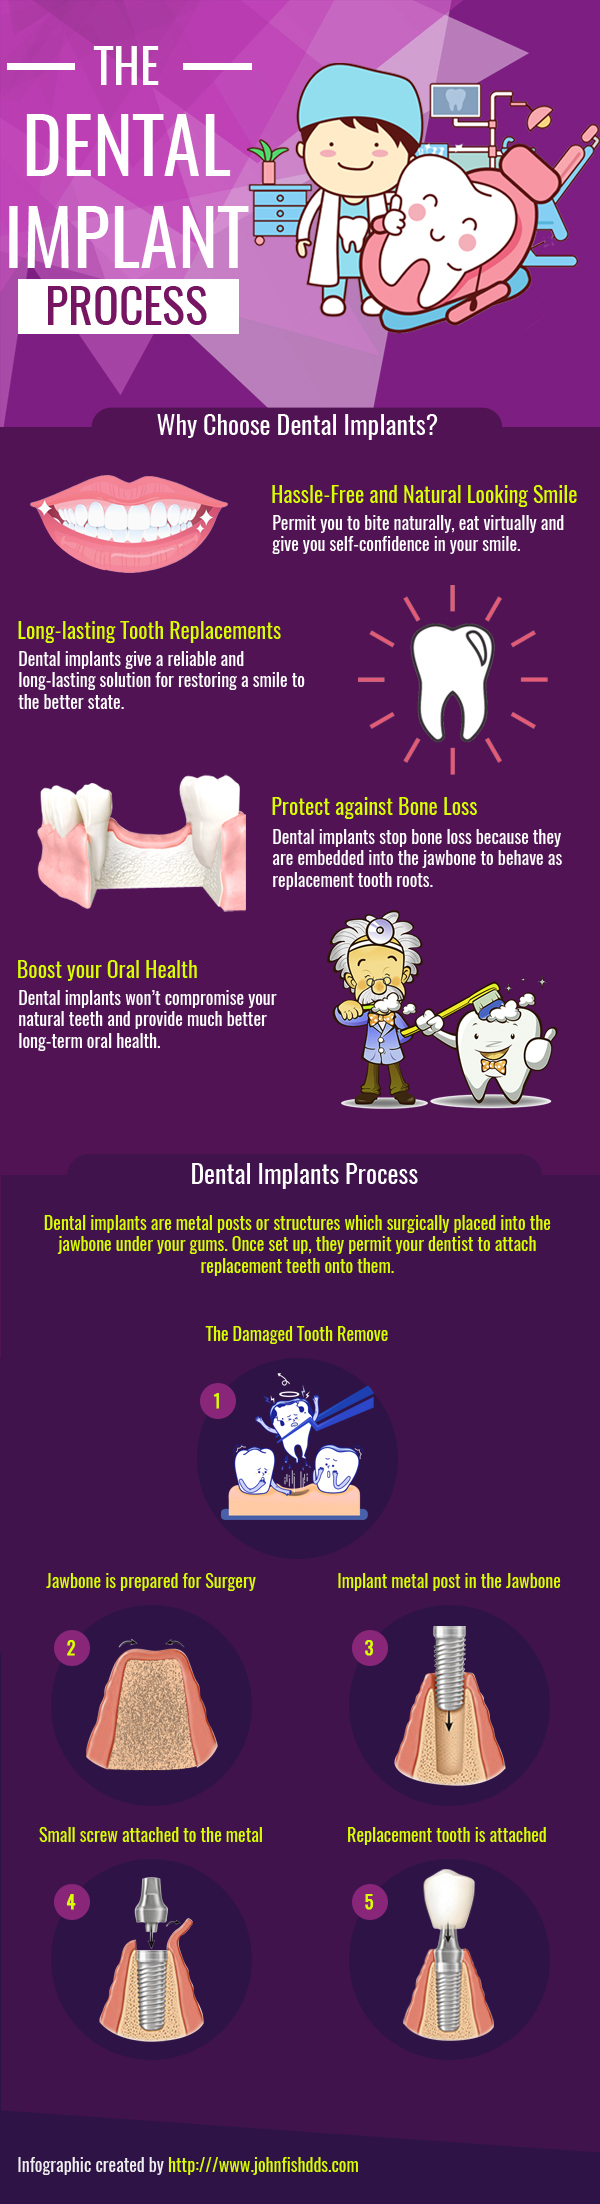 Dental Implant Process 1